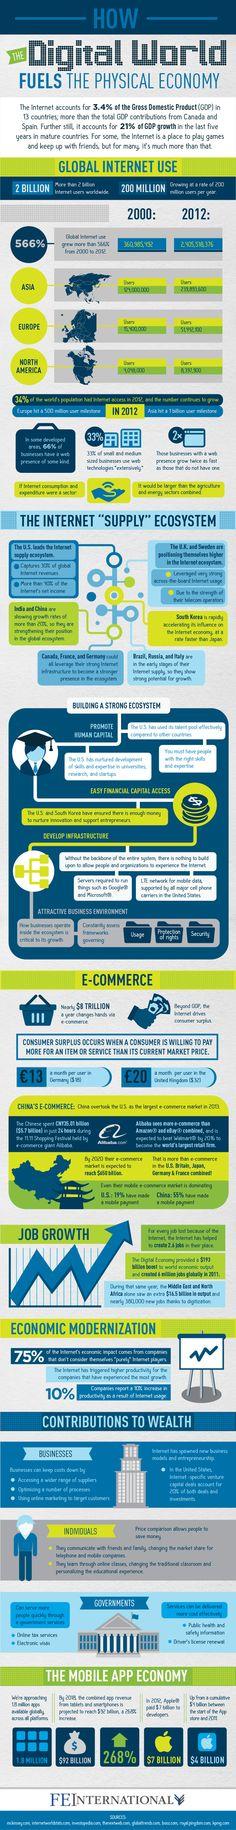 How The Digital World Fuels The Physical Economy [Infographic Internet Marketing, Social Media Marketing, Digital Communication, Marketing Magazine, Ignorance, Best Credit Cards, Digital Strategy, Digital Trends, Digital Media